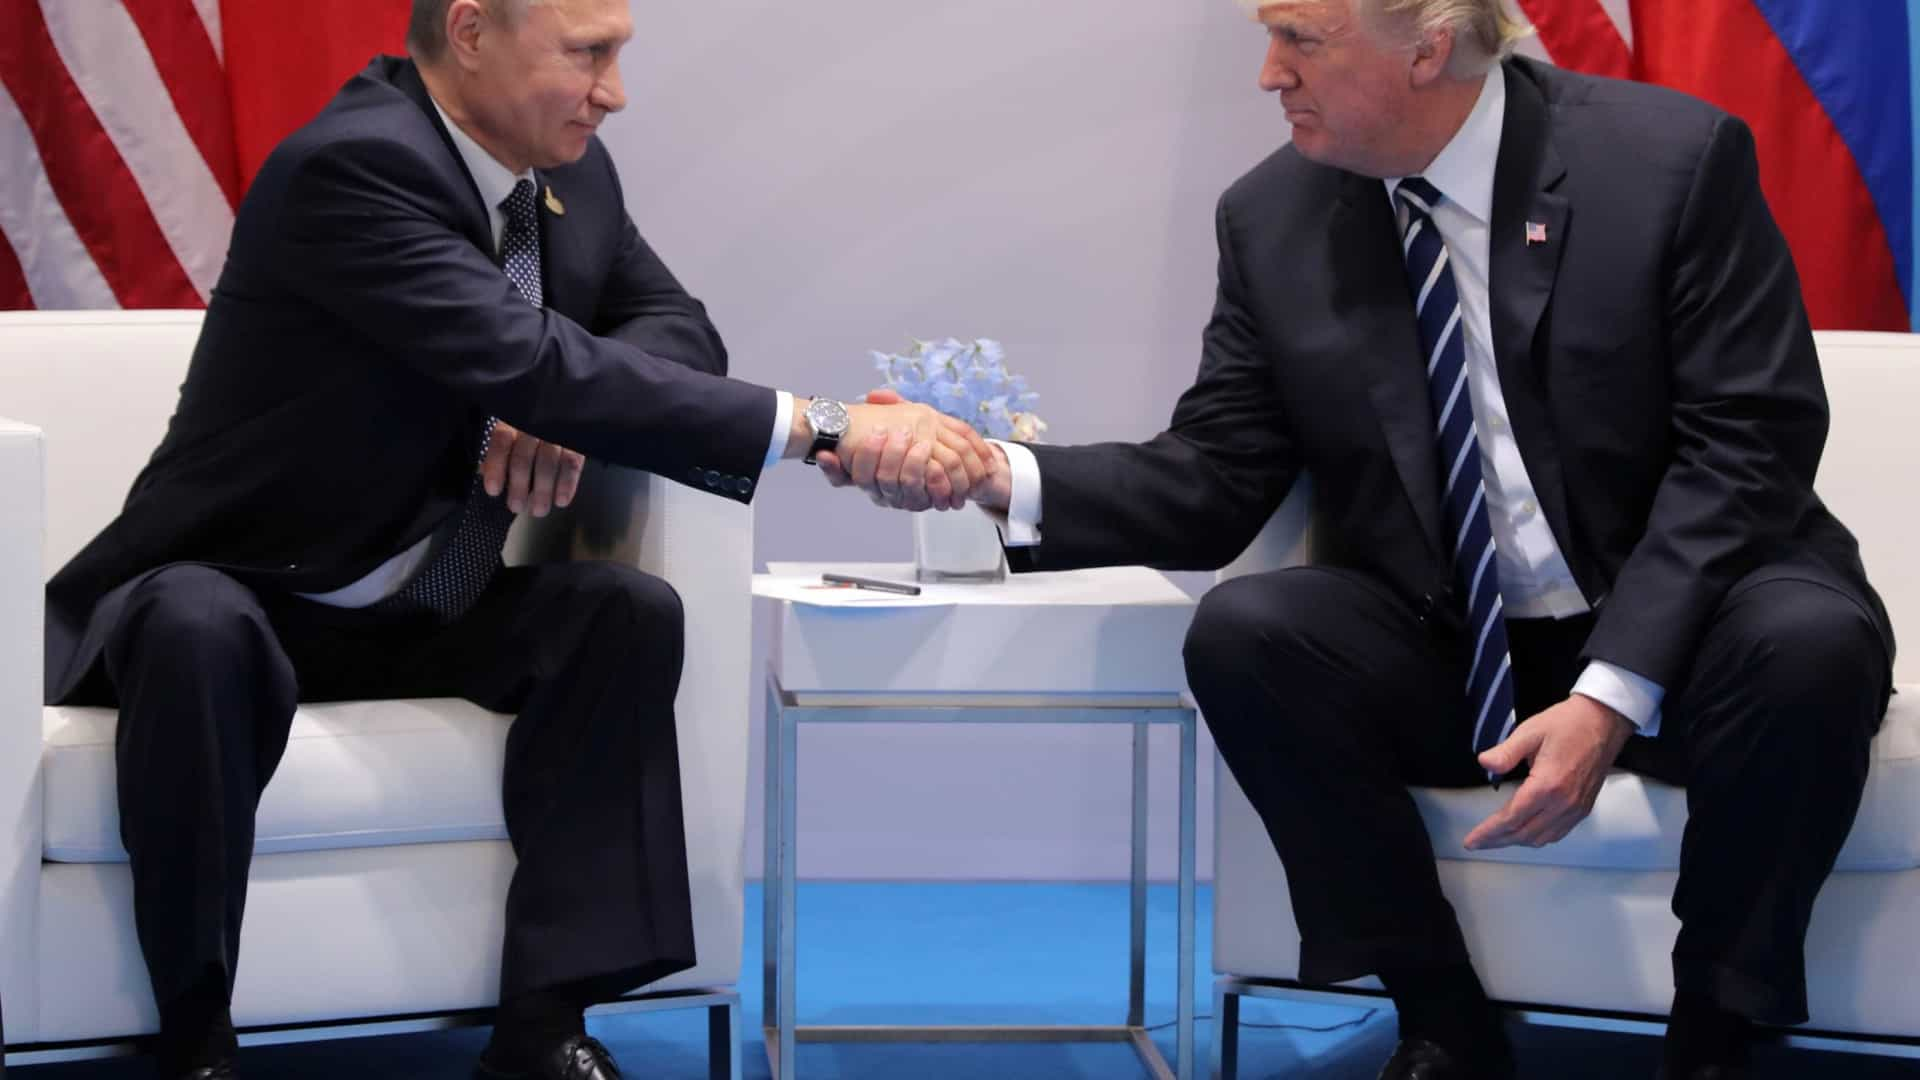 Casa Branca confirma encontro entre Donald Trump e Vladimir Putin